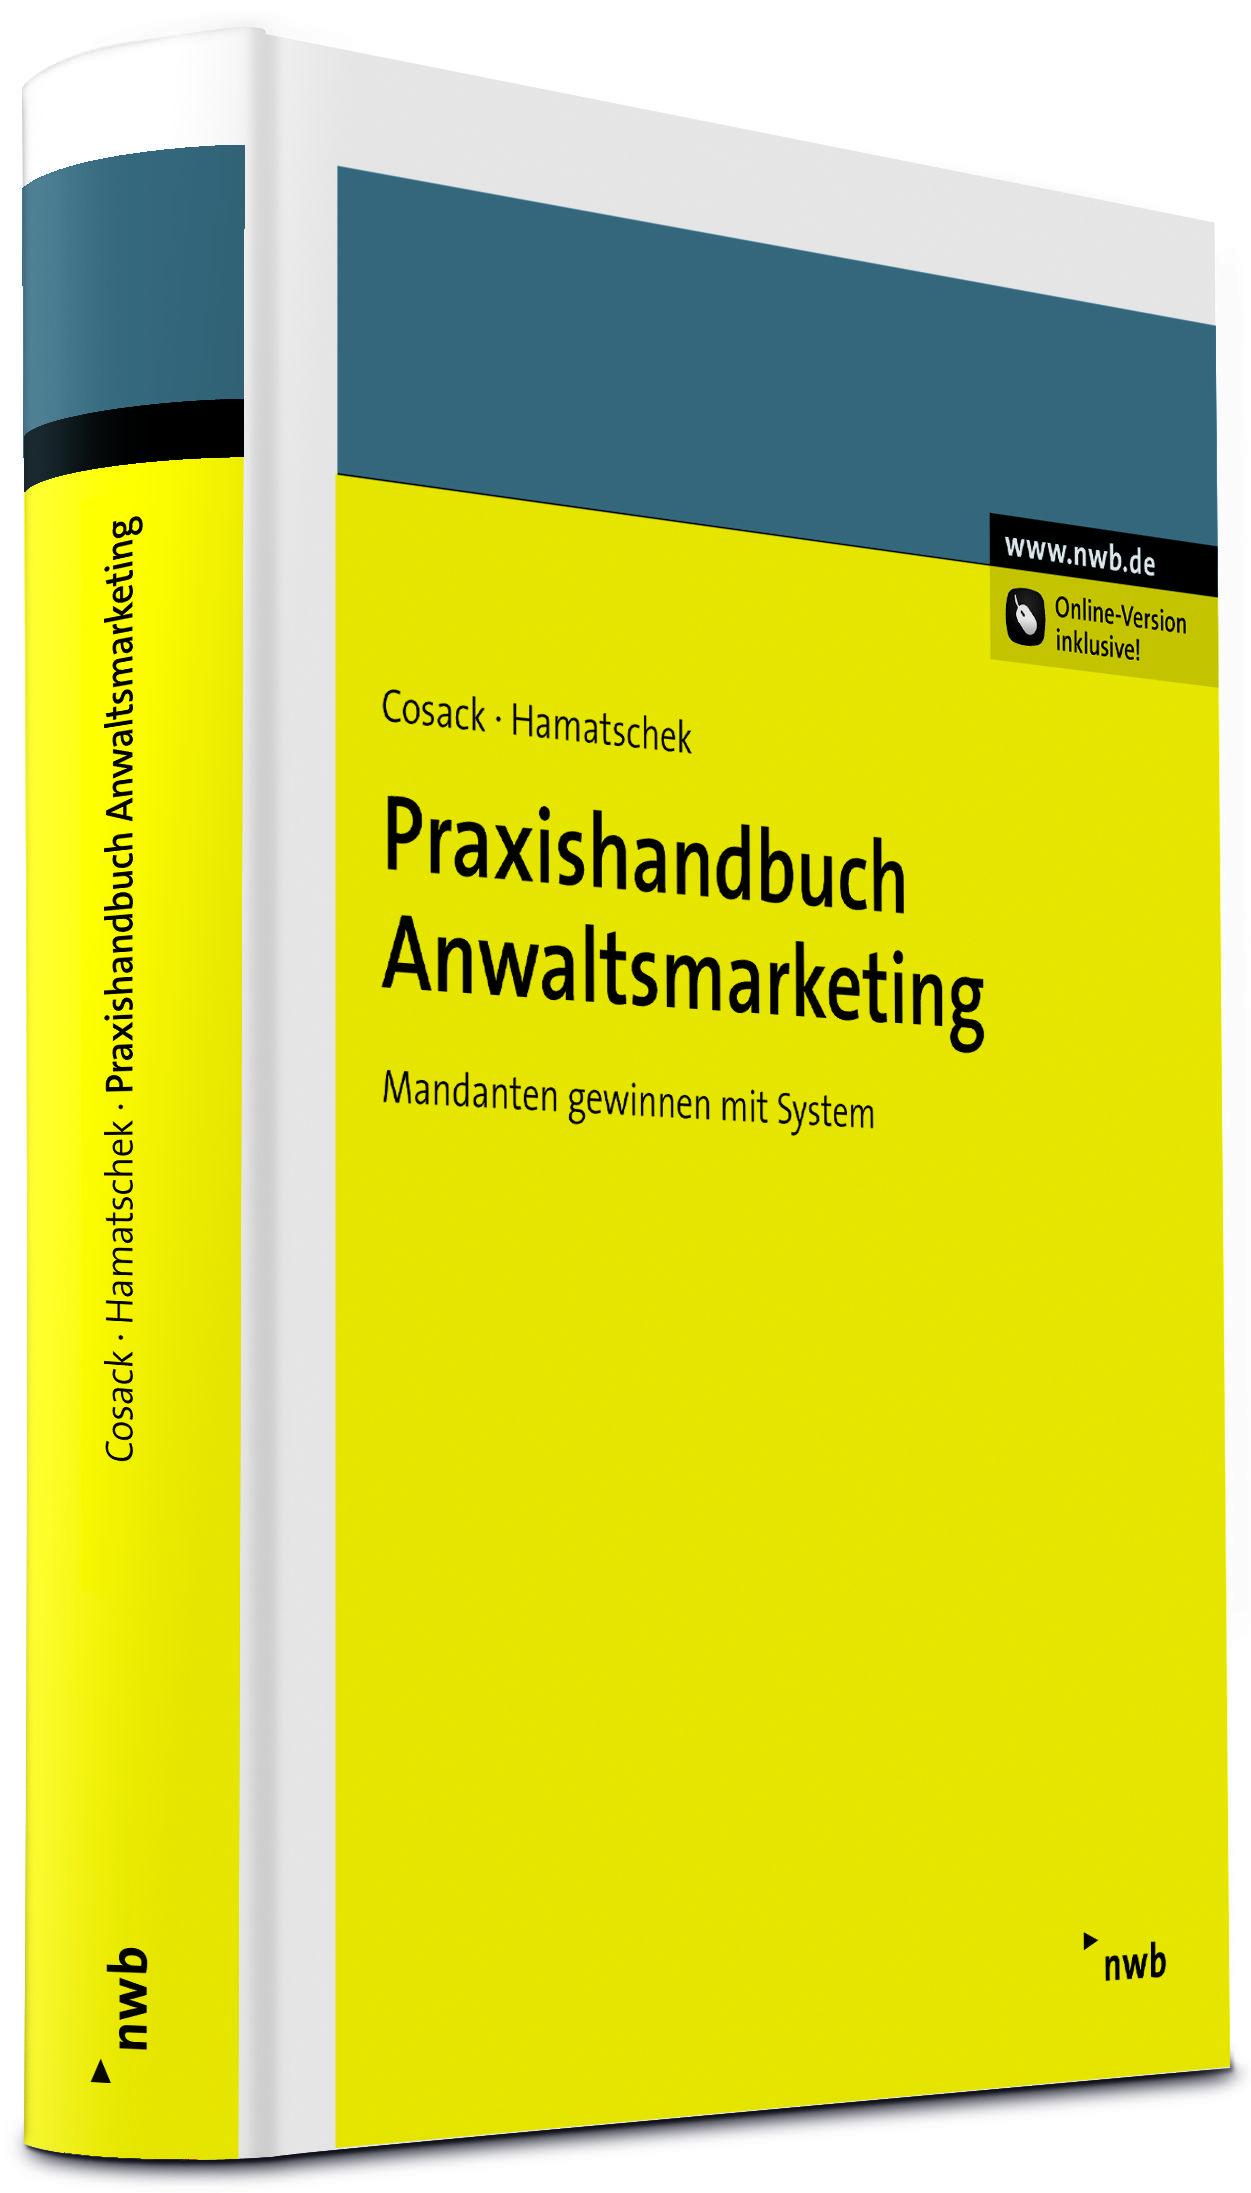 Praxishandbuch Anwaltsmarketing -    ab November 2012 im Handel